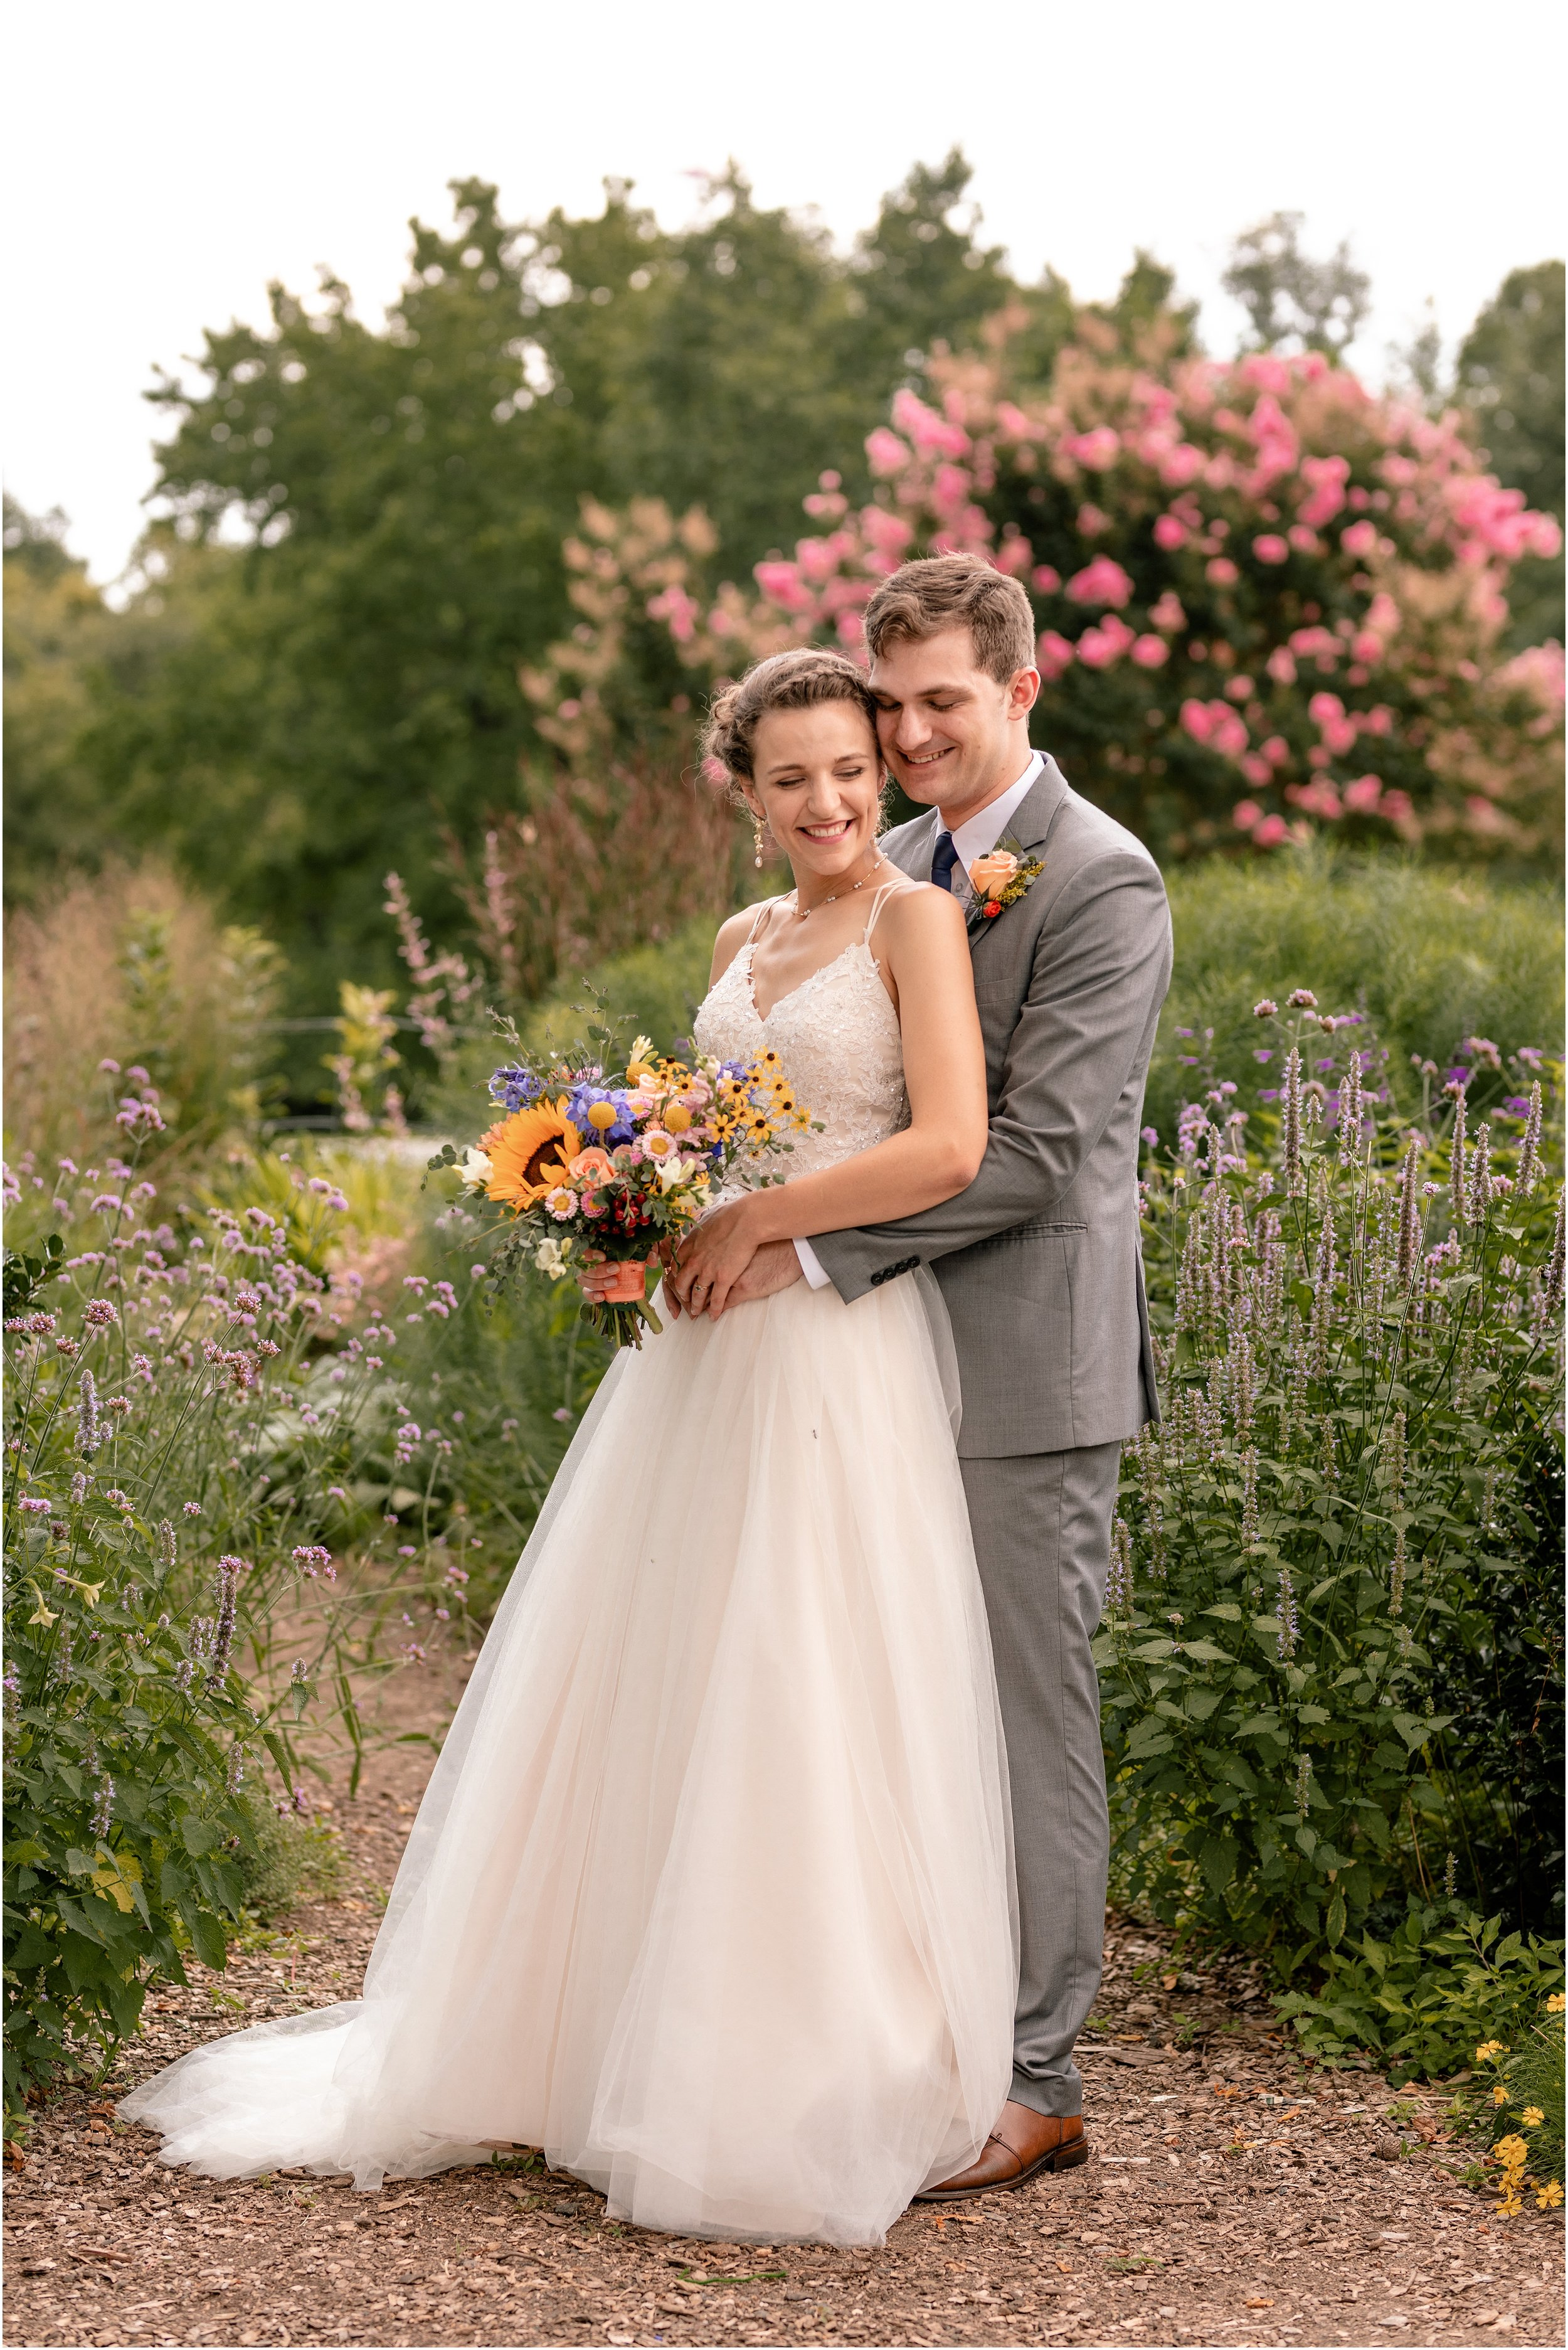 hannah leigh photography Cylburn Arboretum Wedding Baltimore, MD_3421.jpg